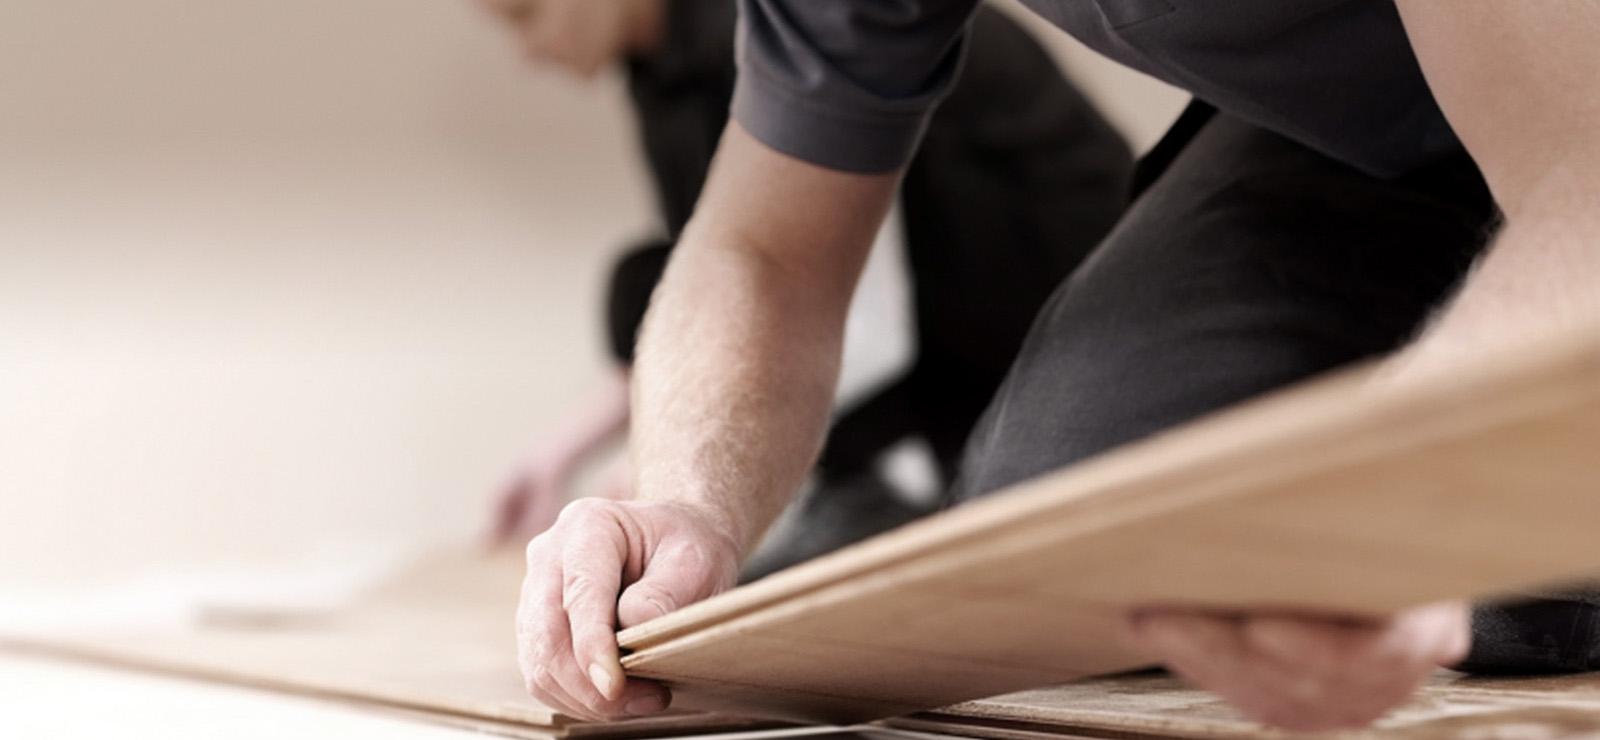 Hardwood flooring installation refinishing experts lrt for Local hardwood flooring companies